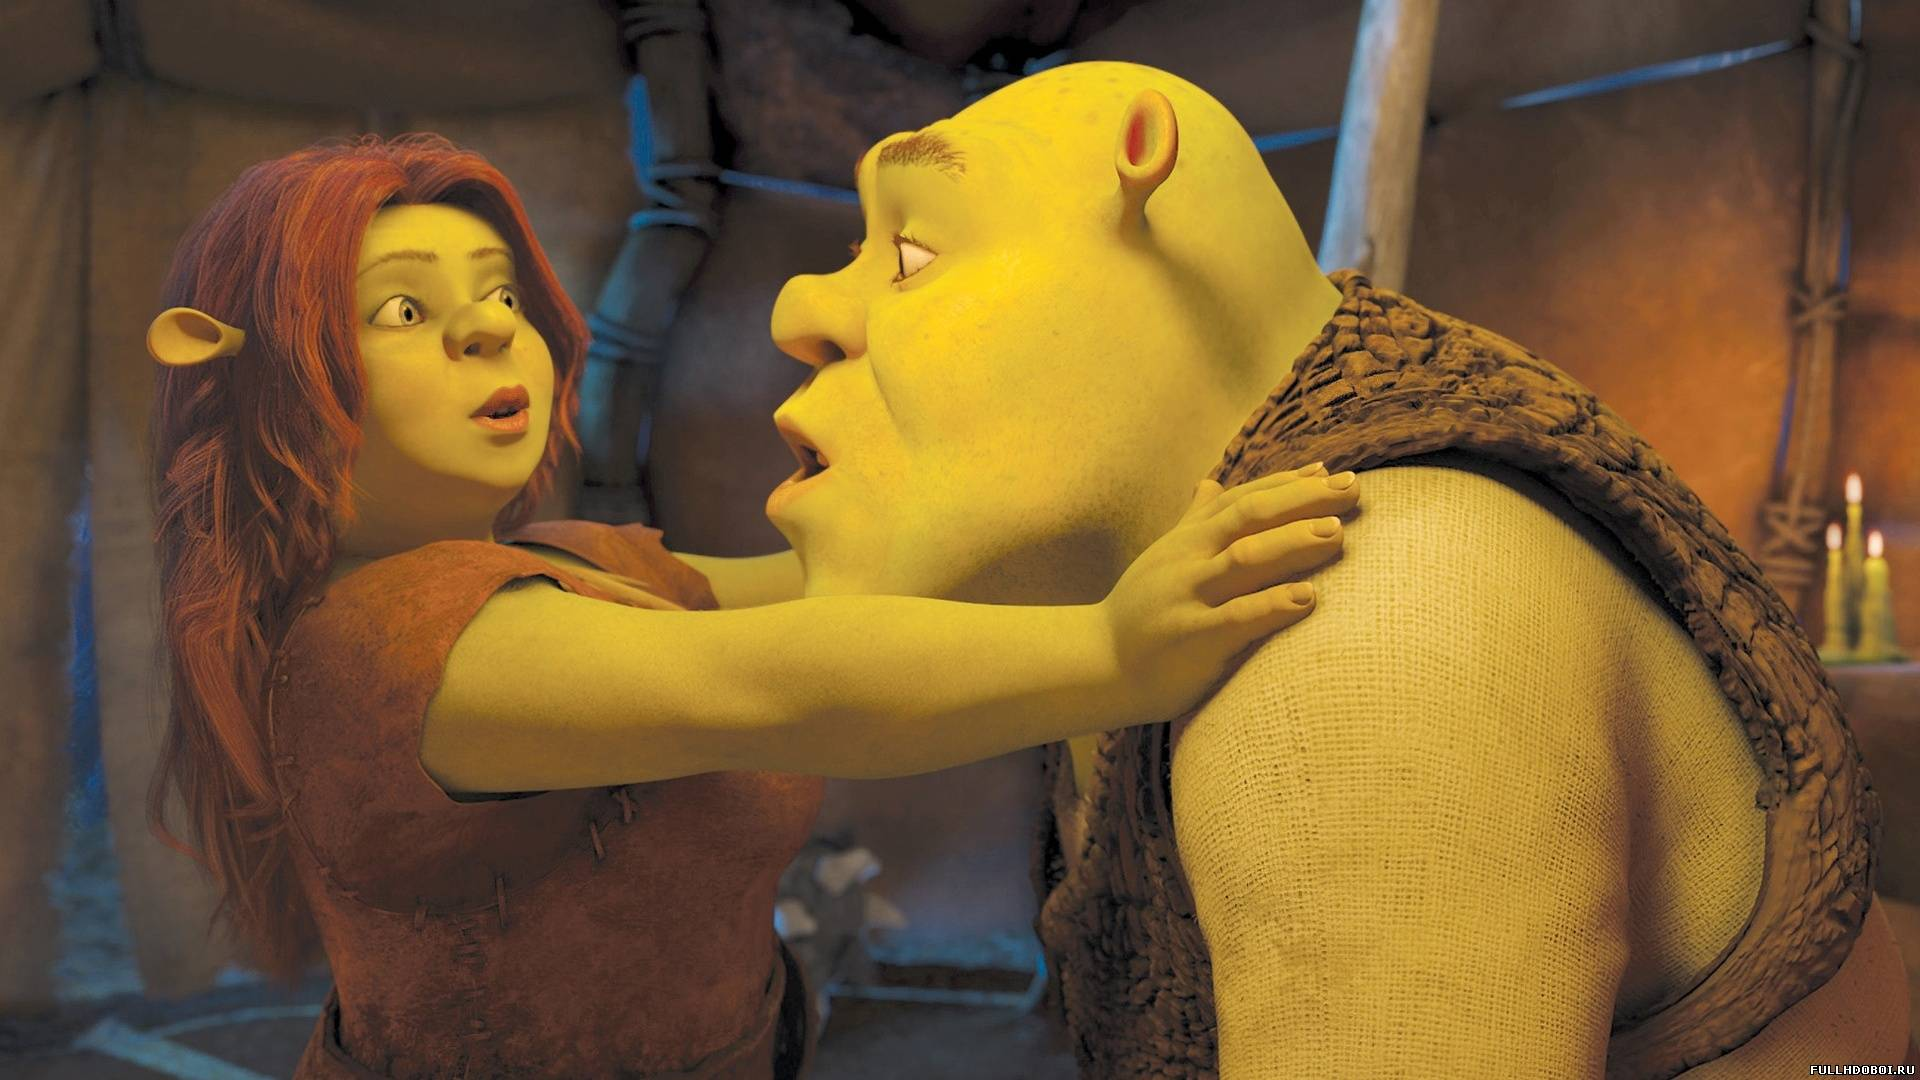 Shrek ogr fiona porn anime tight bitches